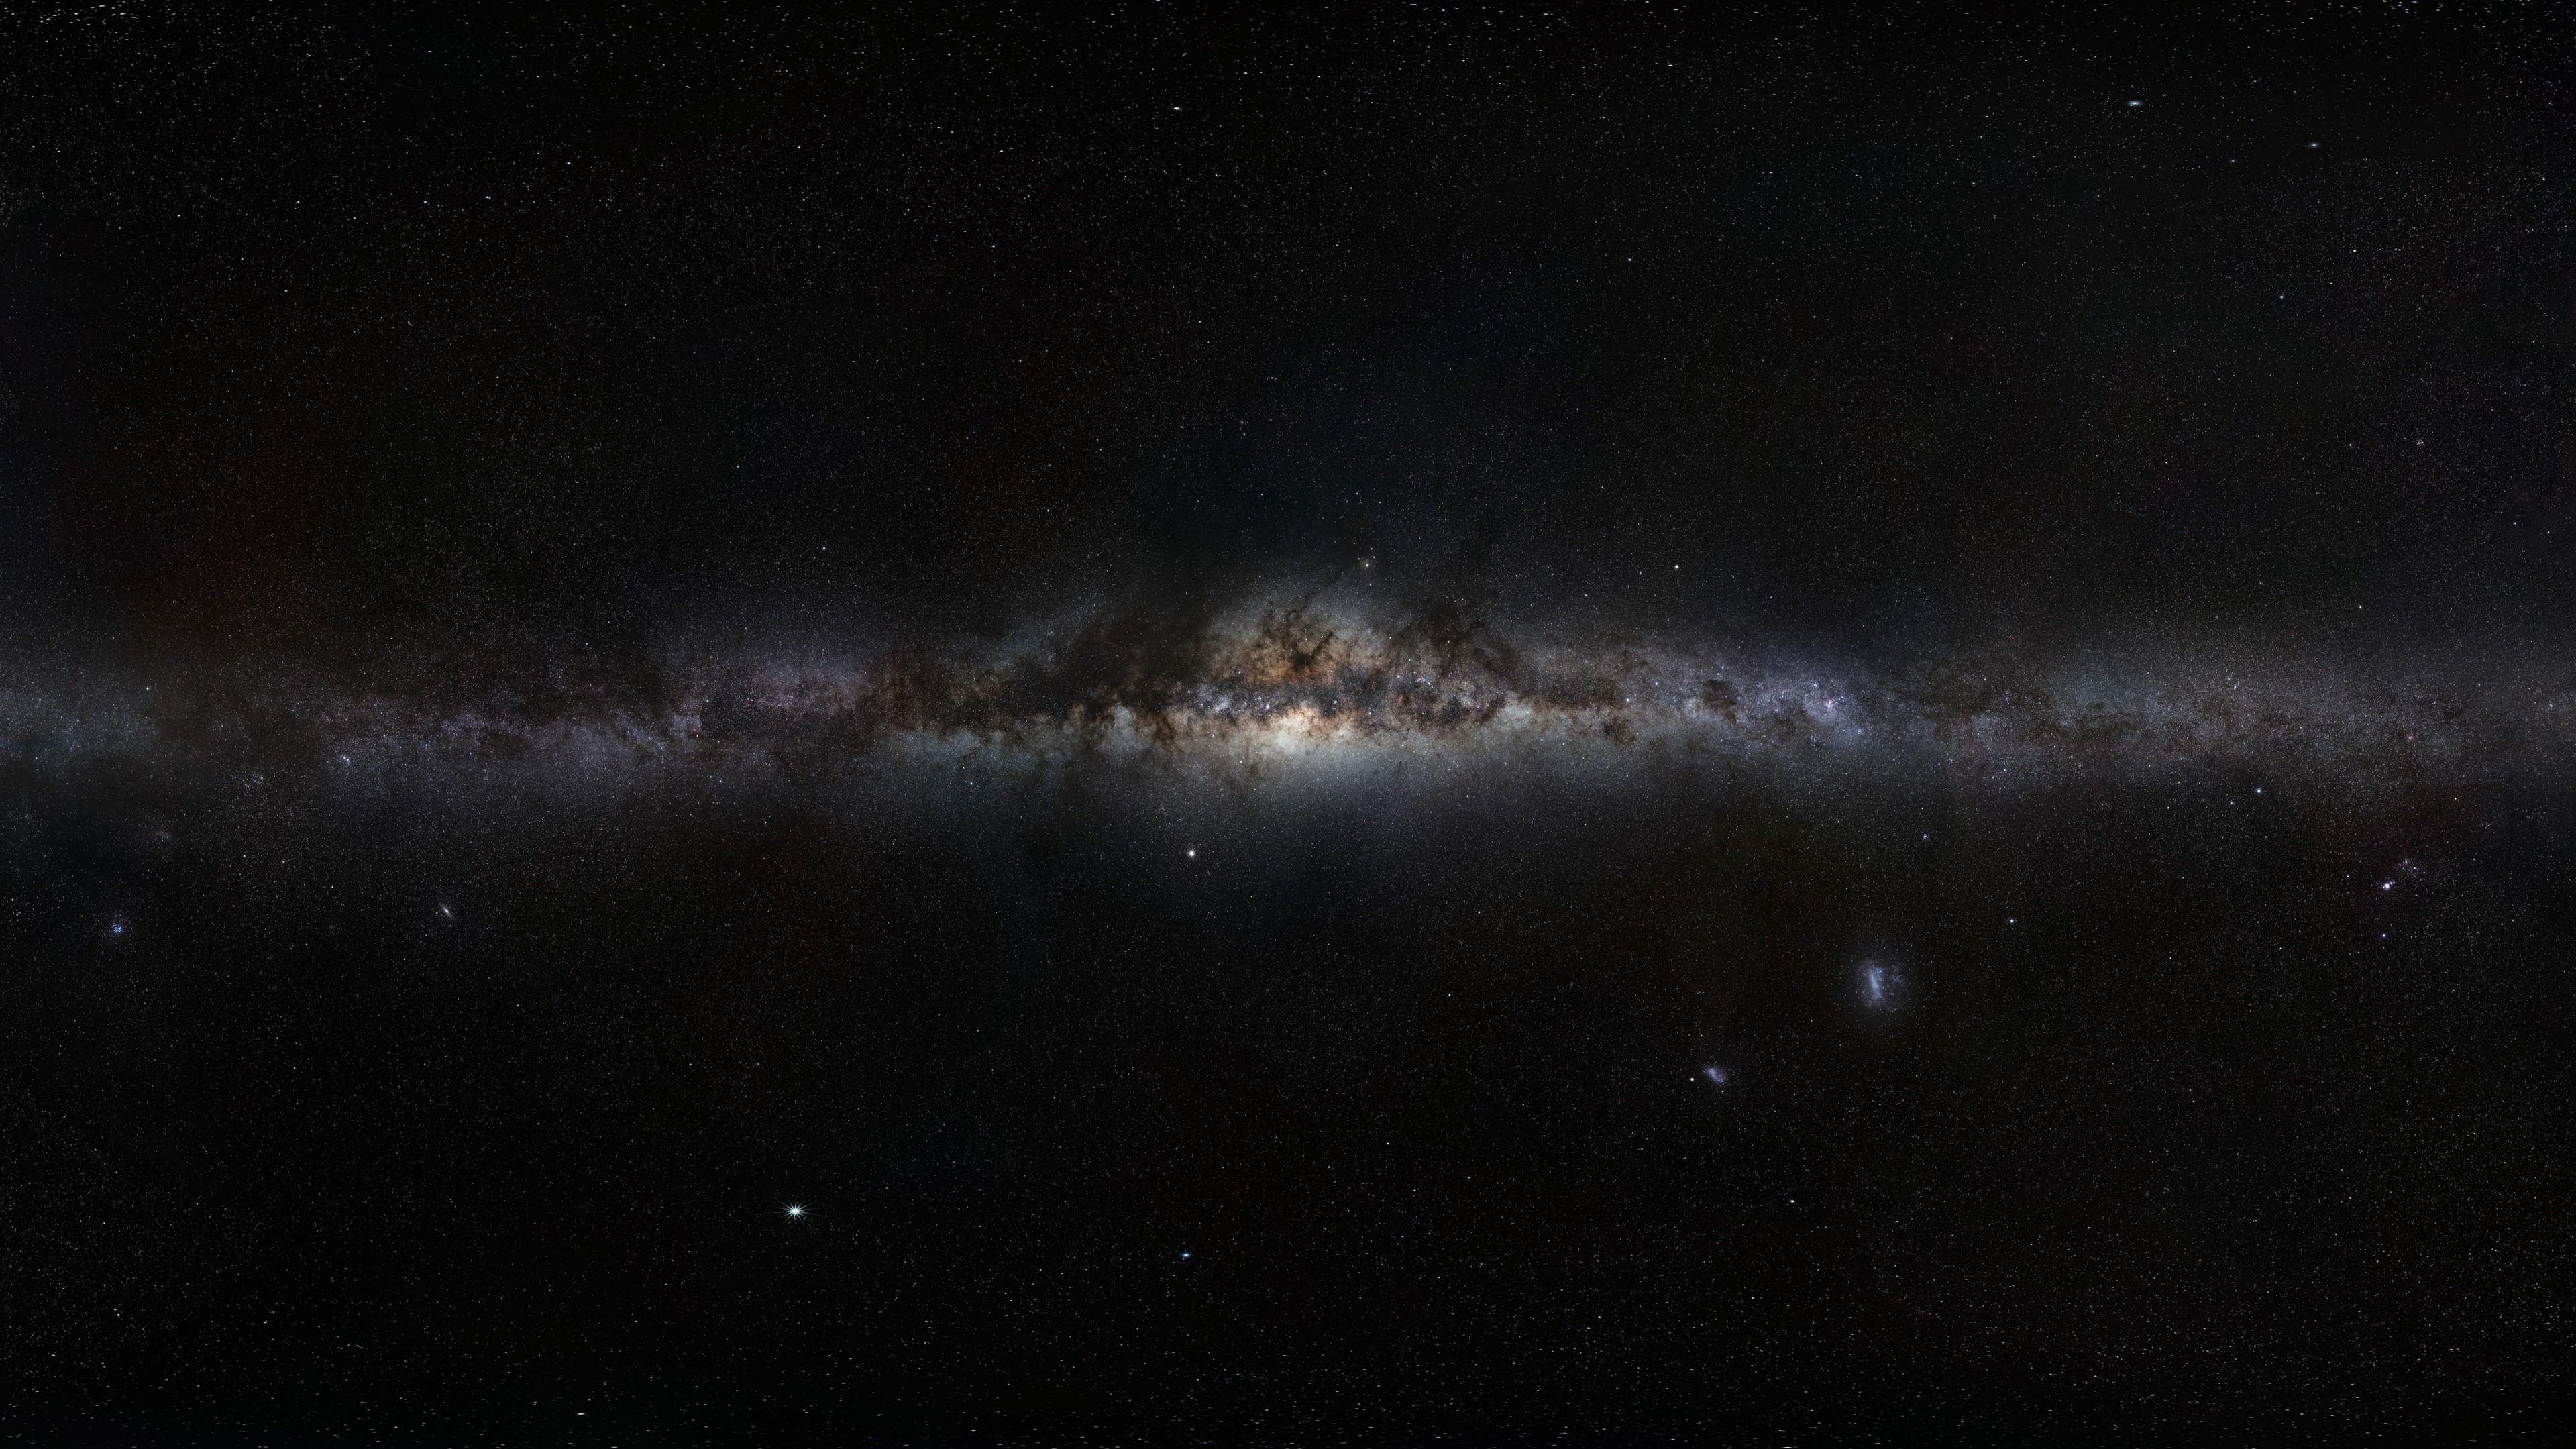 3840x2160 Black Galaxy Wallpapers HD